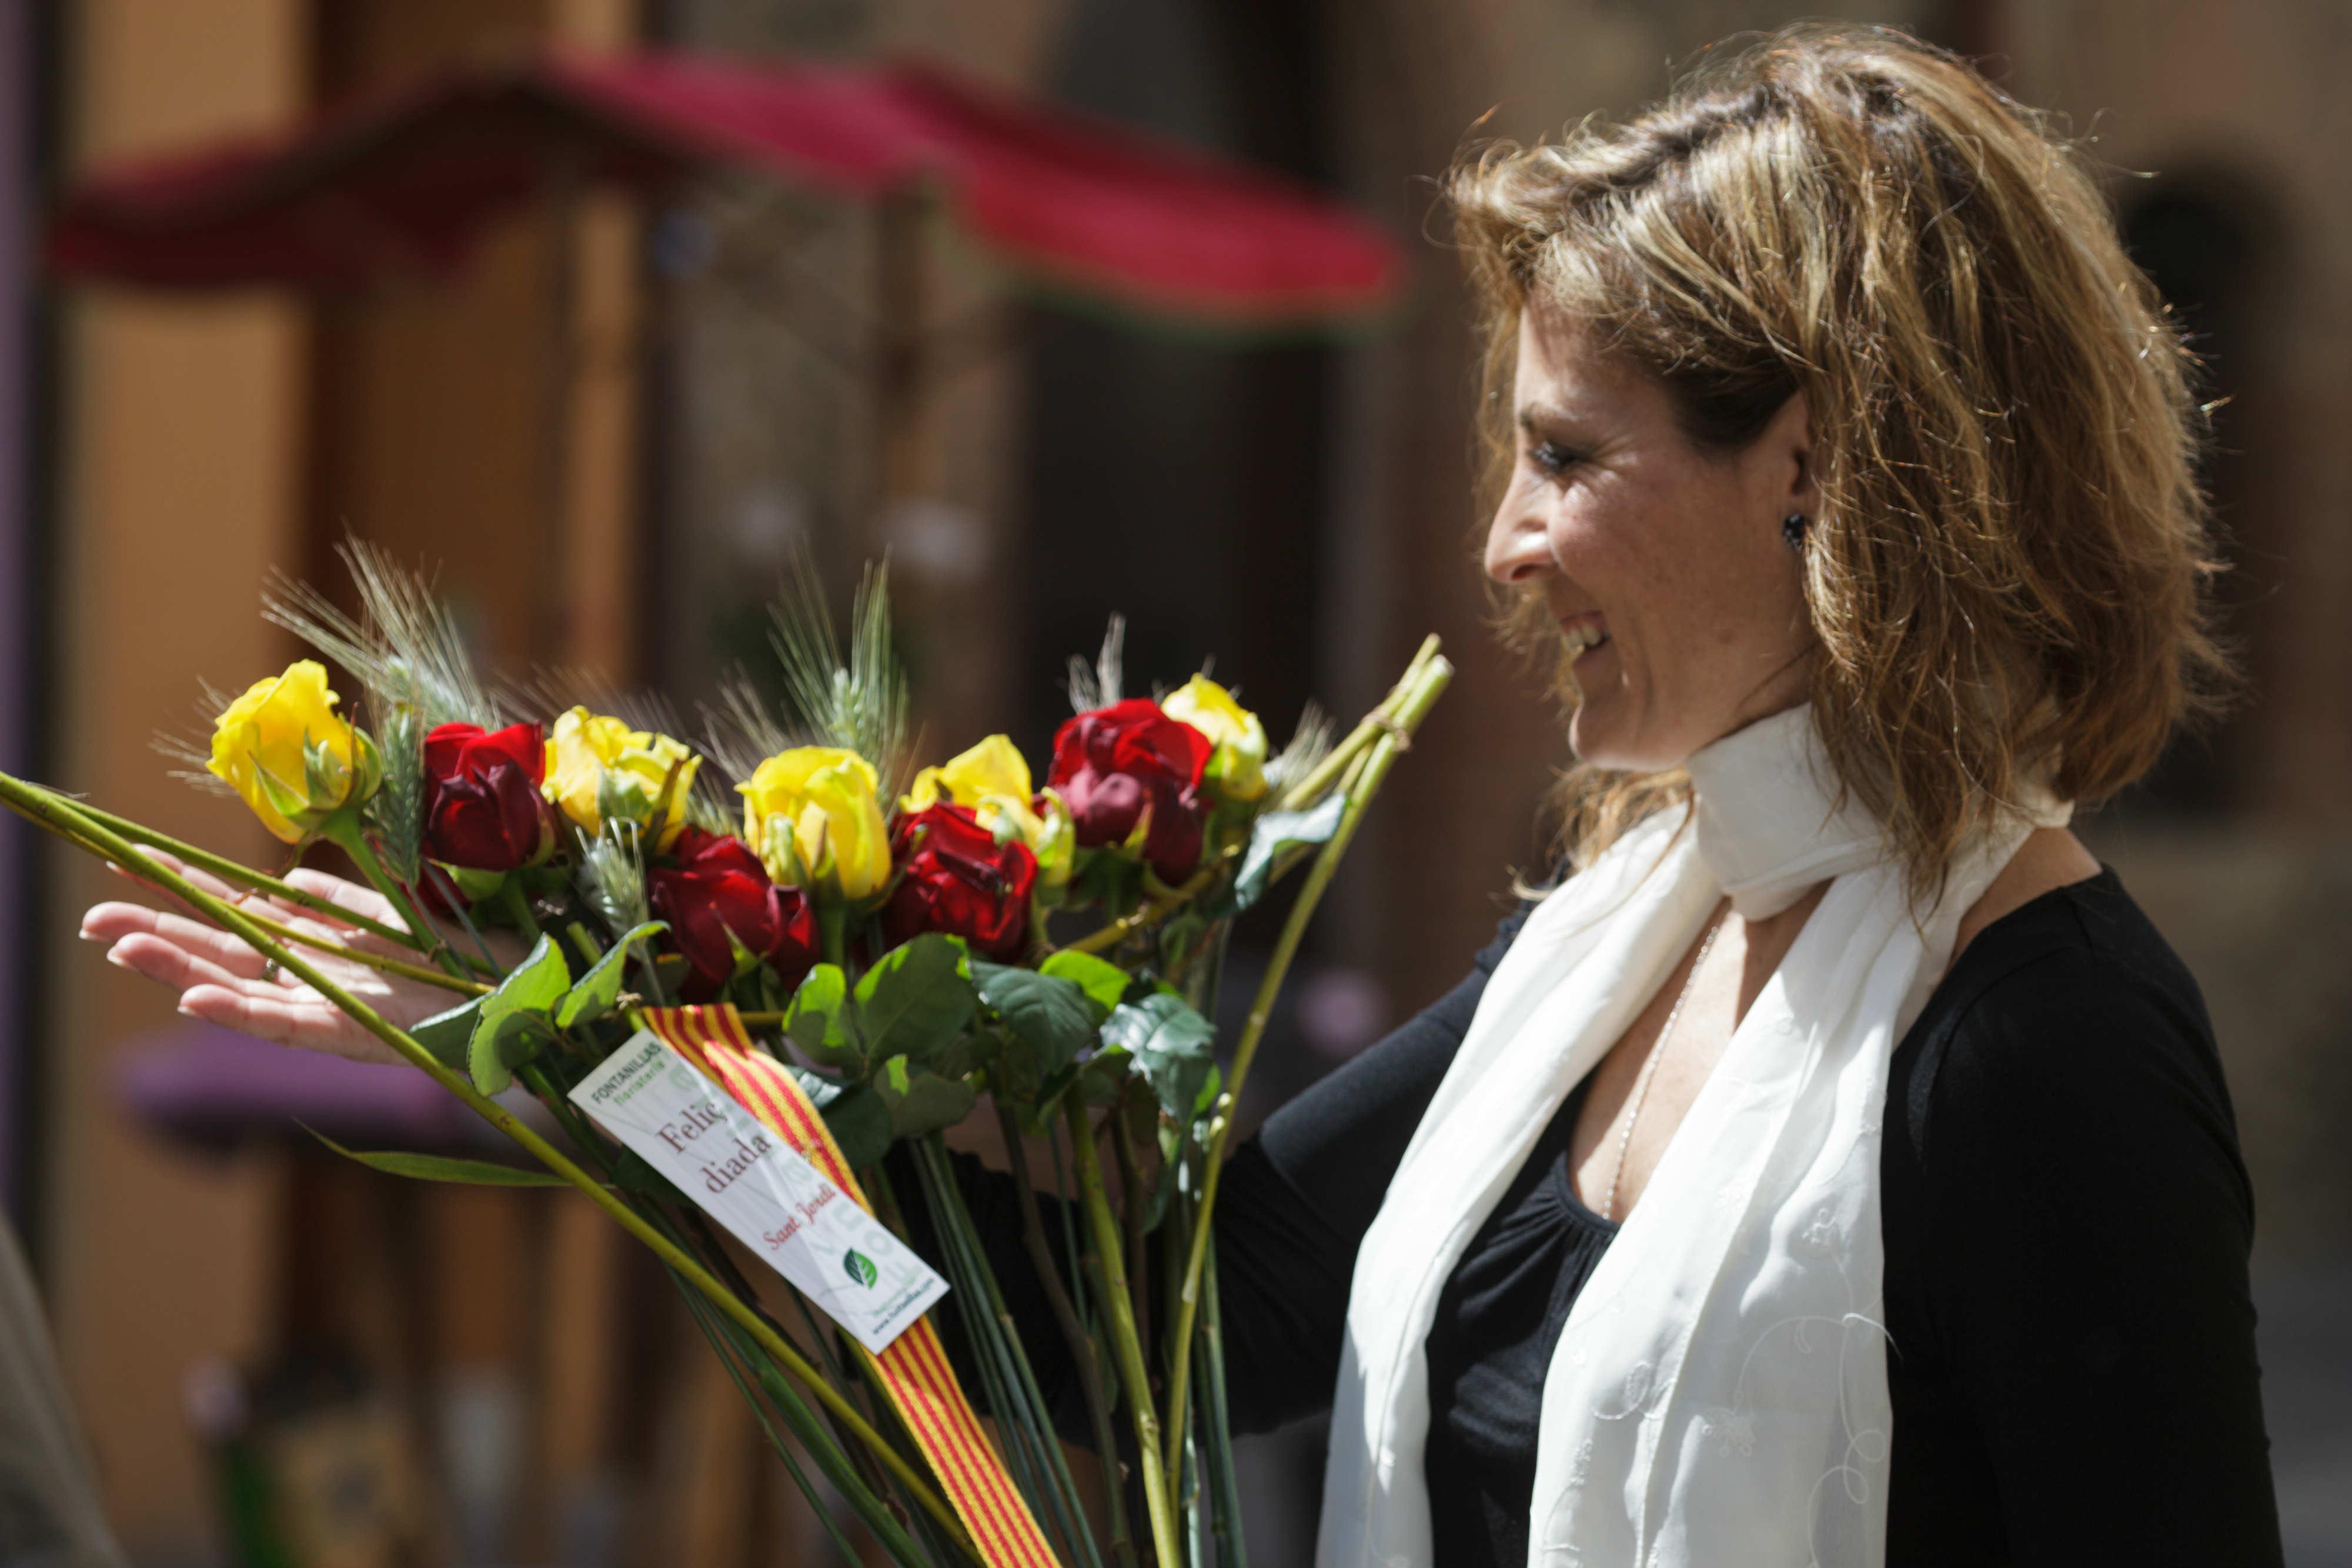 St Jordi's Day Carles Fontanilla Porta Nova 3